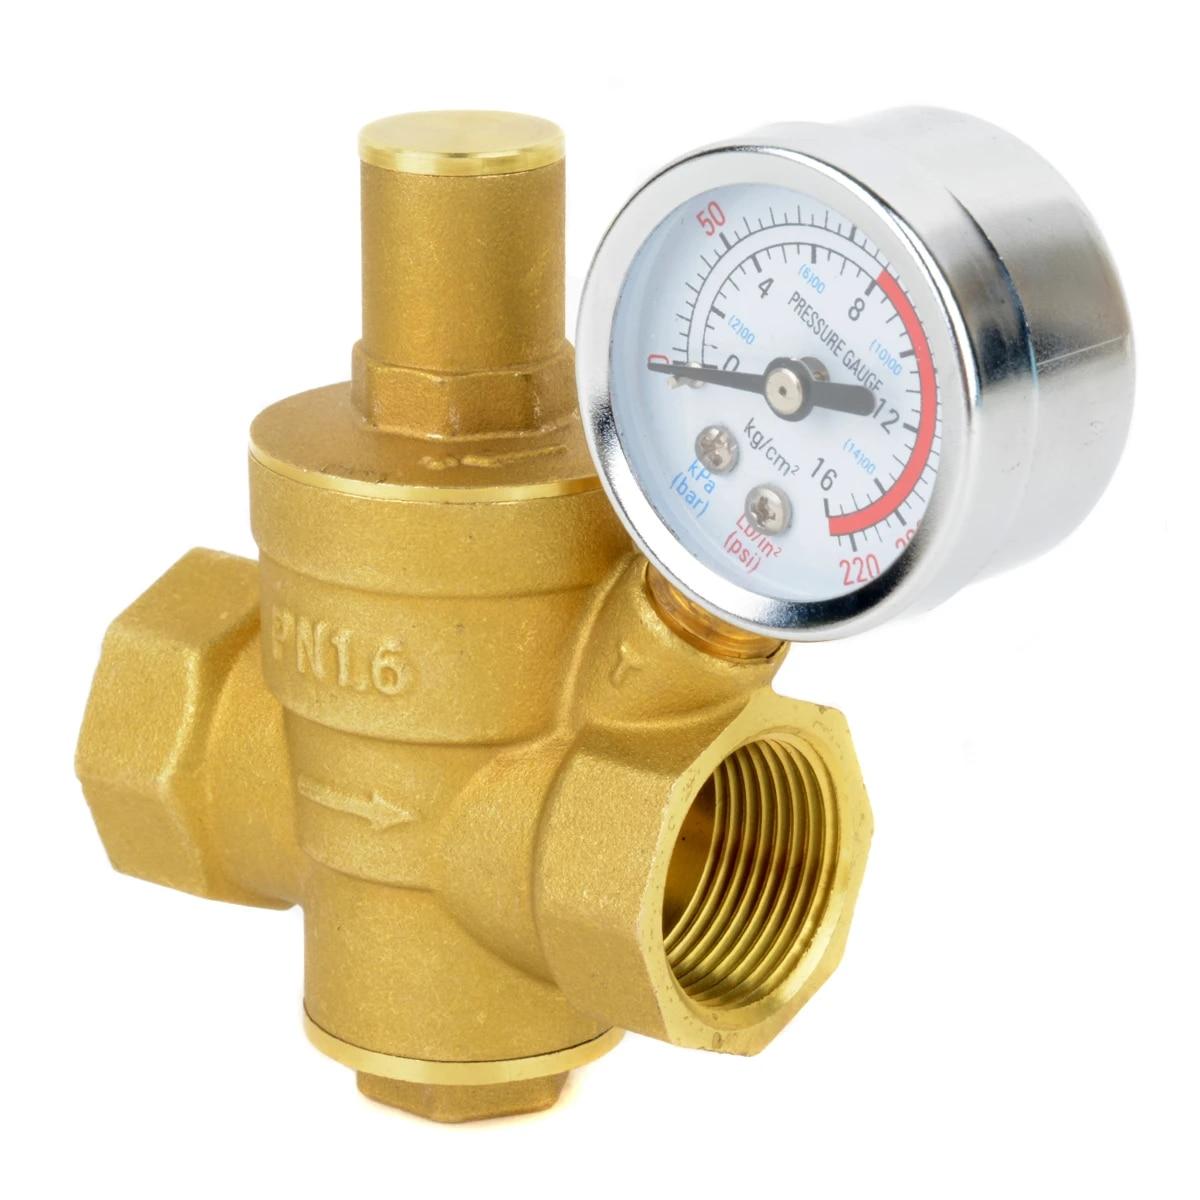 DN20 Adjustable Brass Water Pressure Regulator Pressure Reducing Valve with Gauge Meter